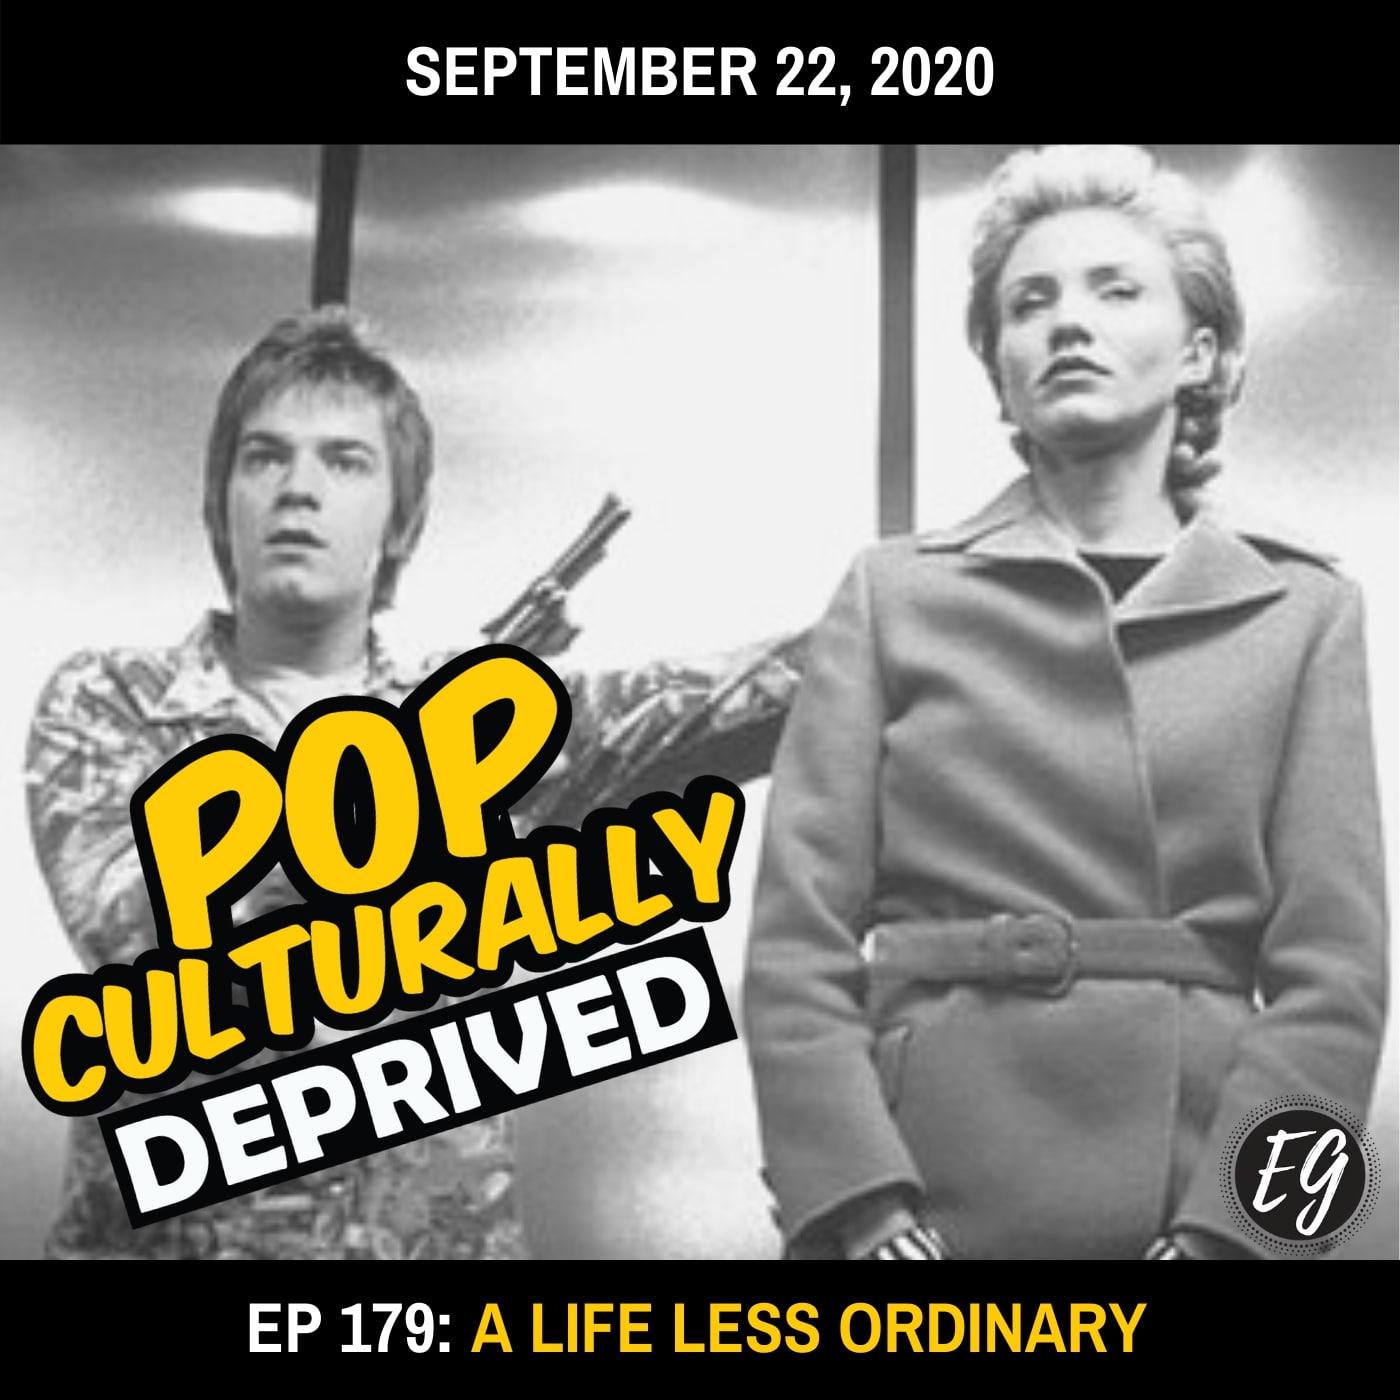 Episode 182: A Life Less Ordinary